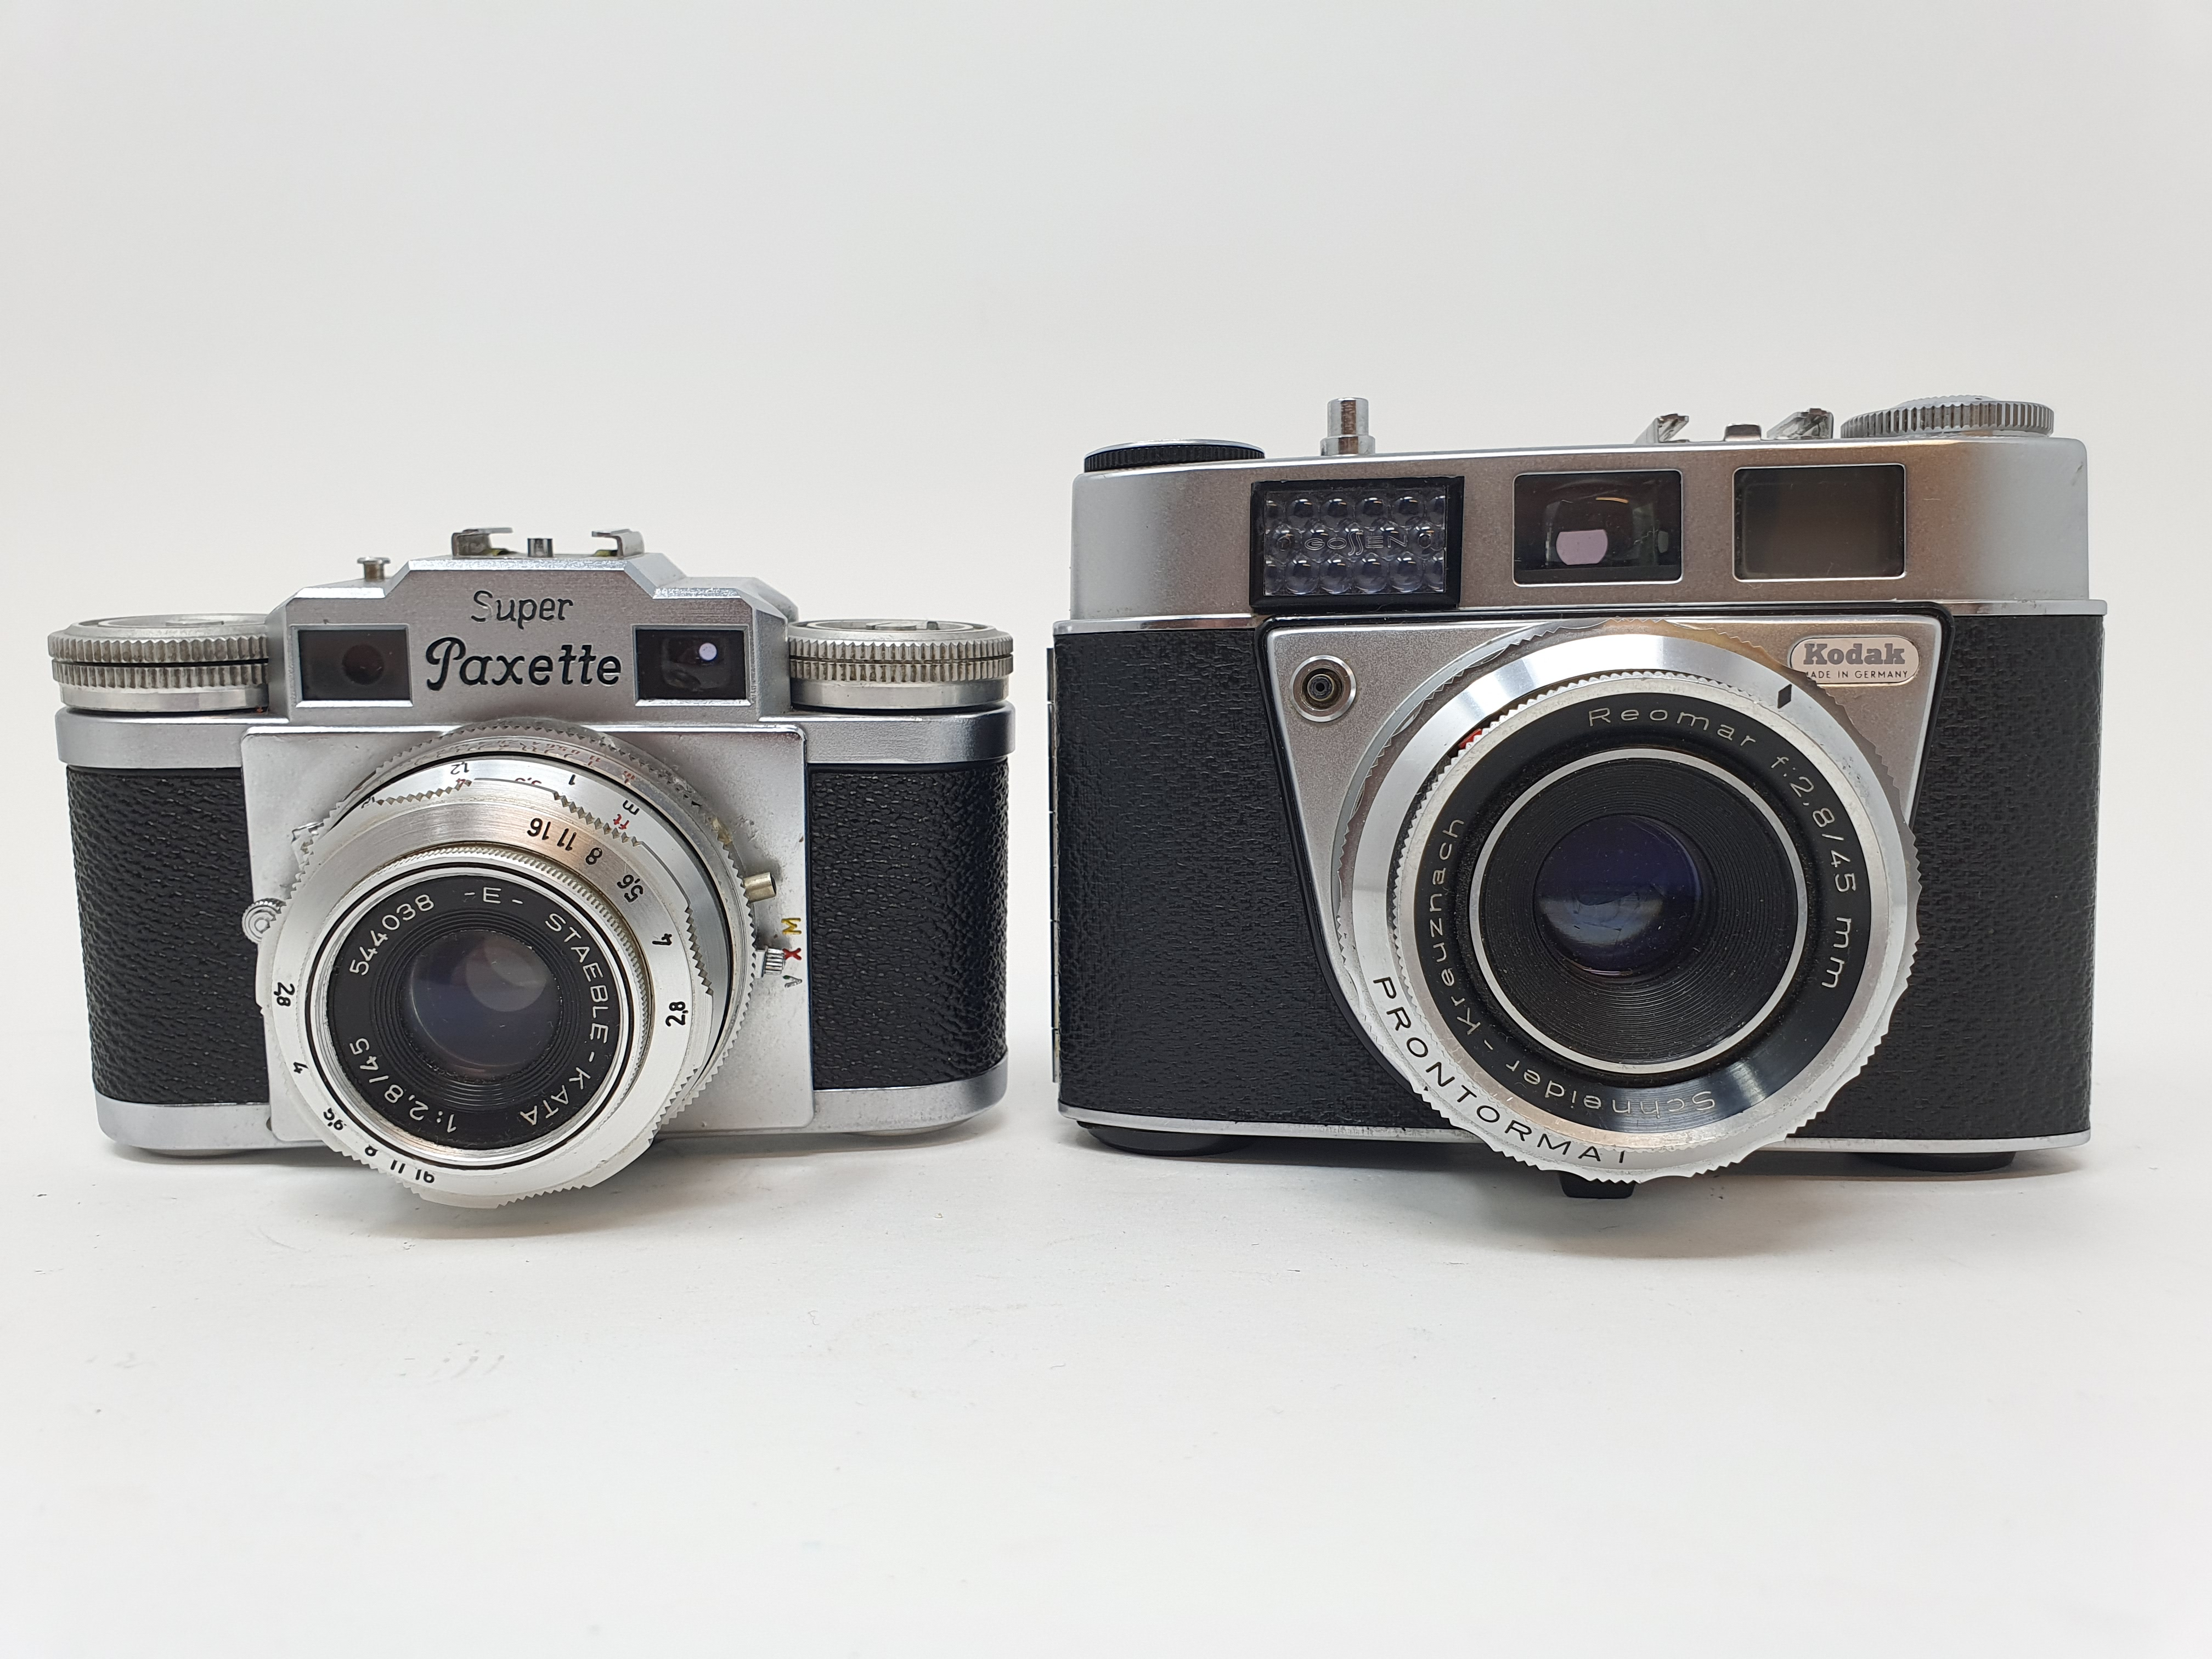 A Kodak Retinette IIA camera and a Braun Super Paxette camera (2) Provenance: Part of a vast